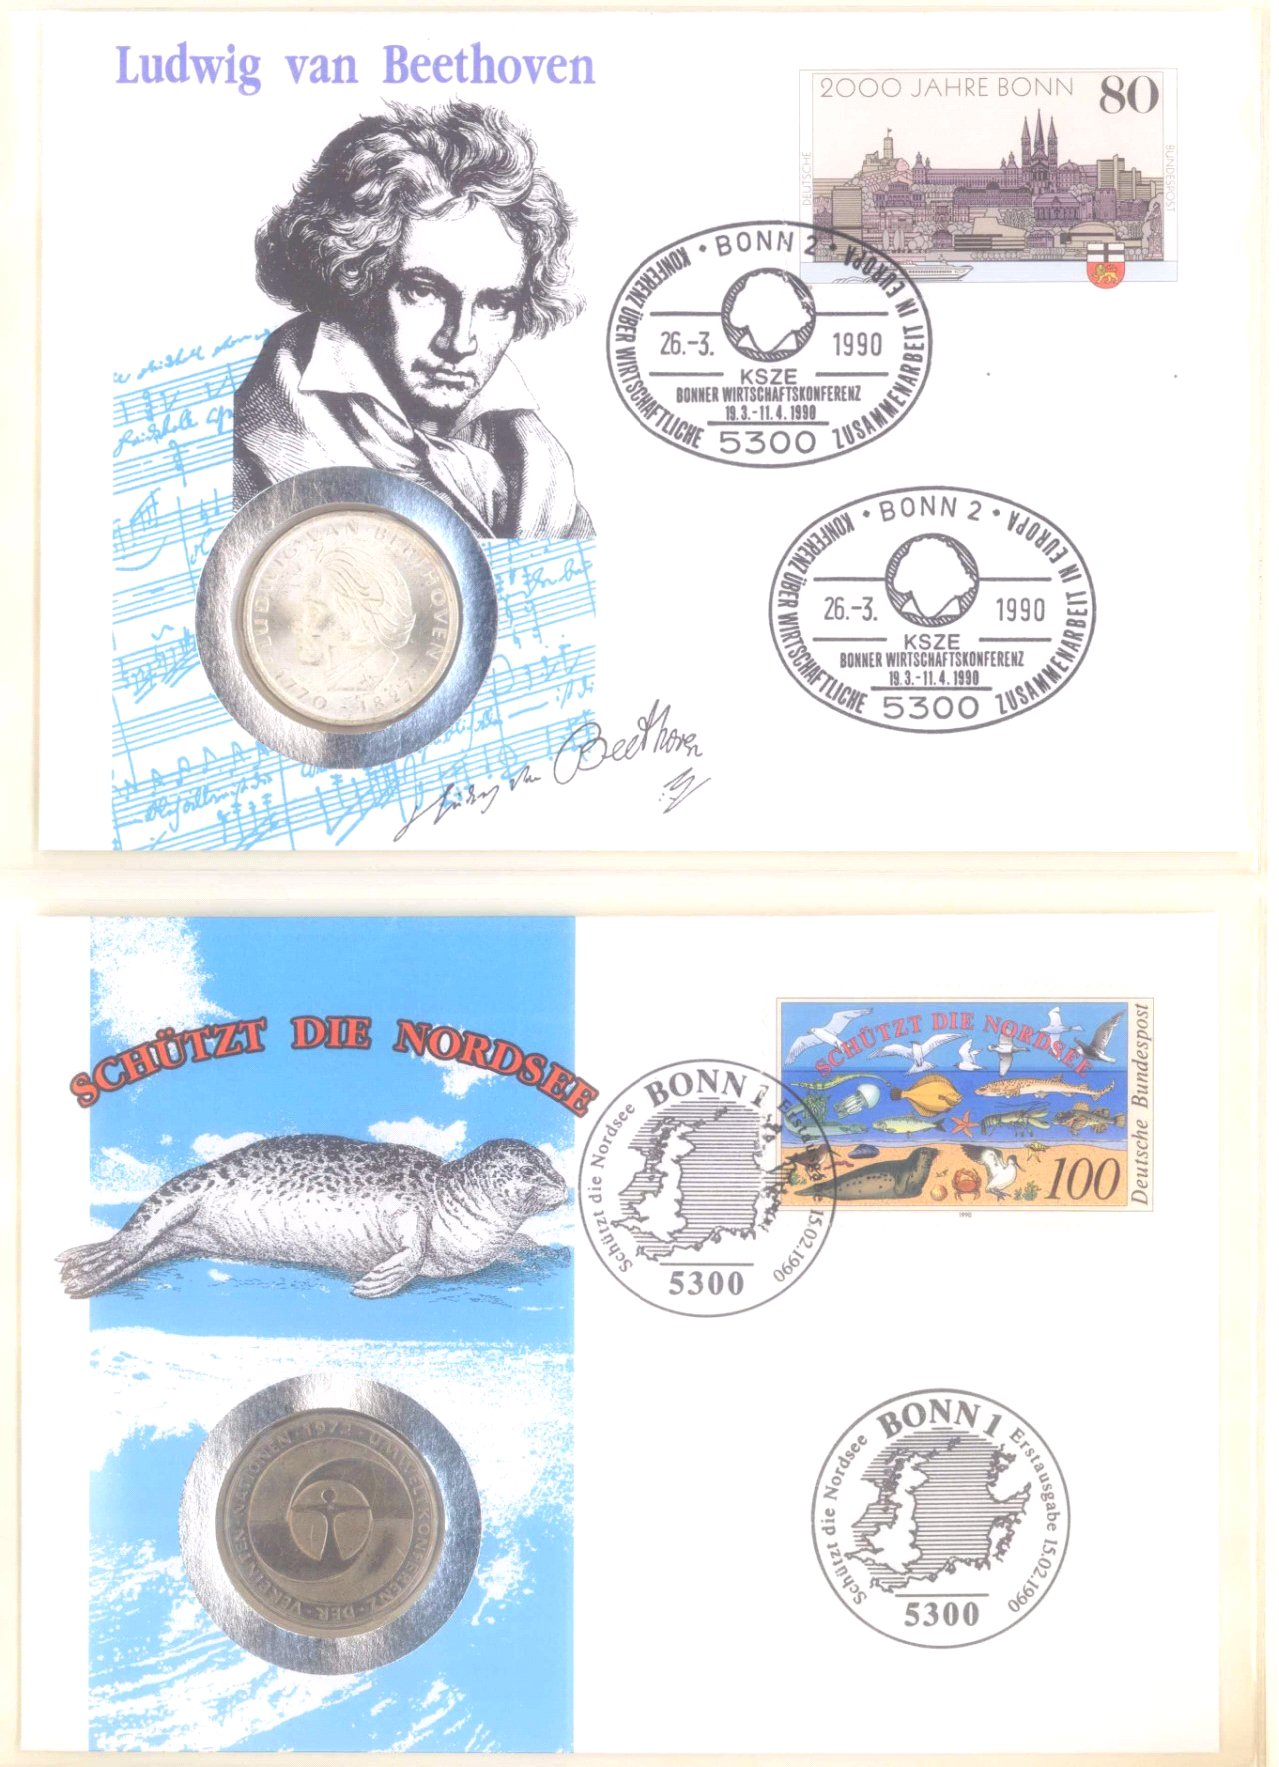 Sammlung Borek Numisbriefe im Ringbinder-6